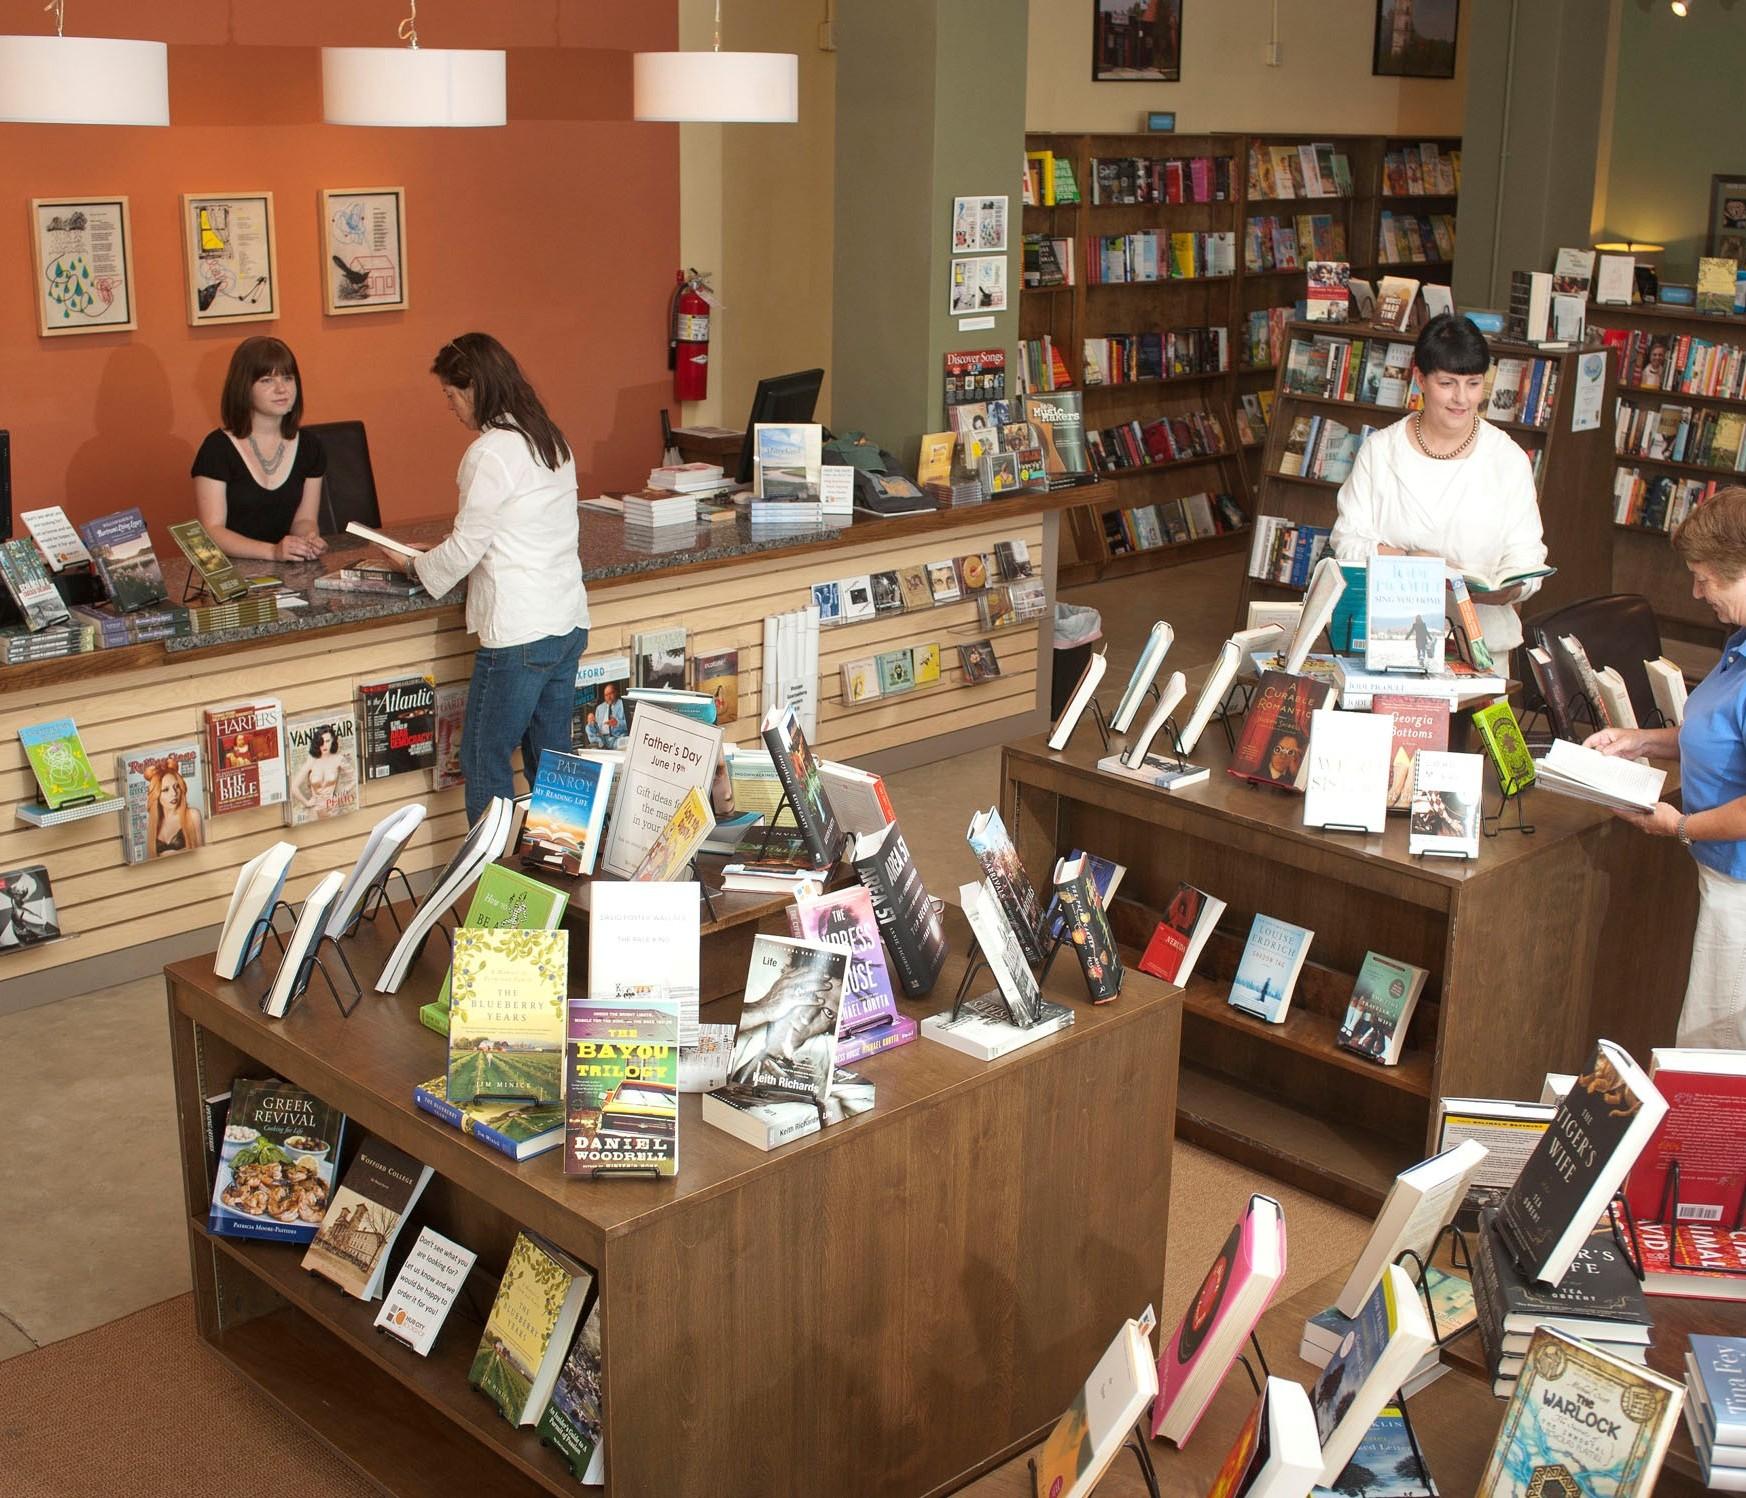 Hub City Bookshop